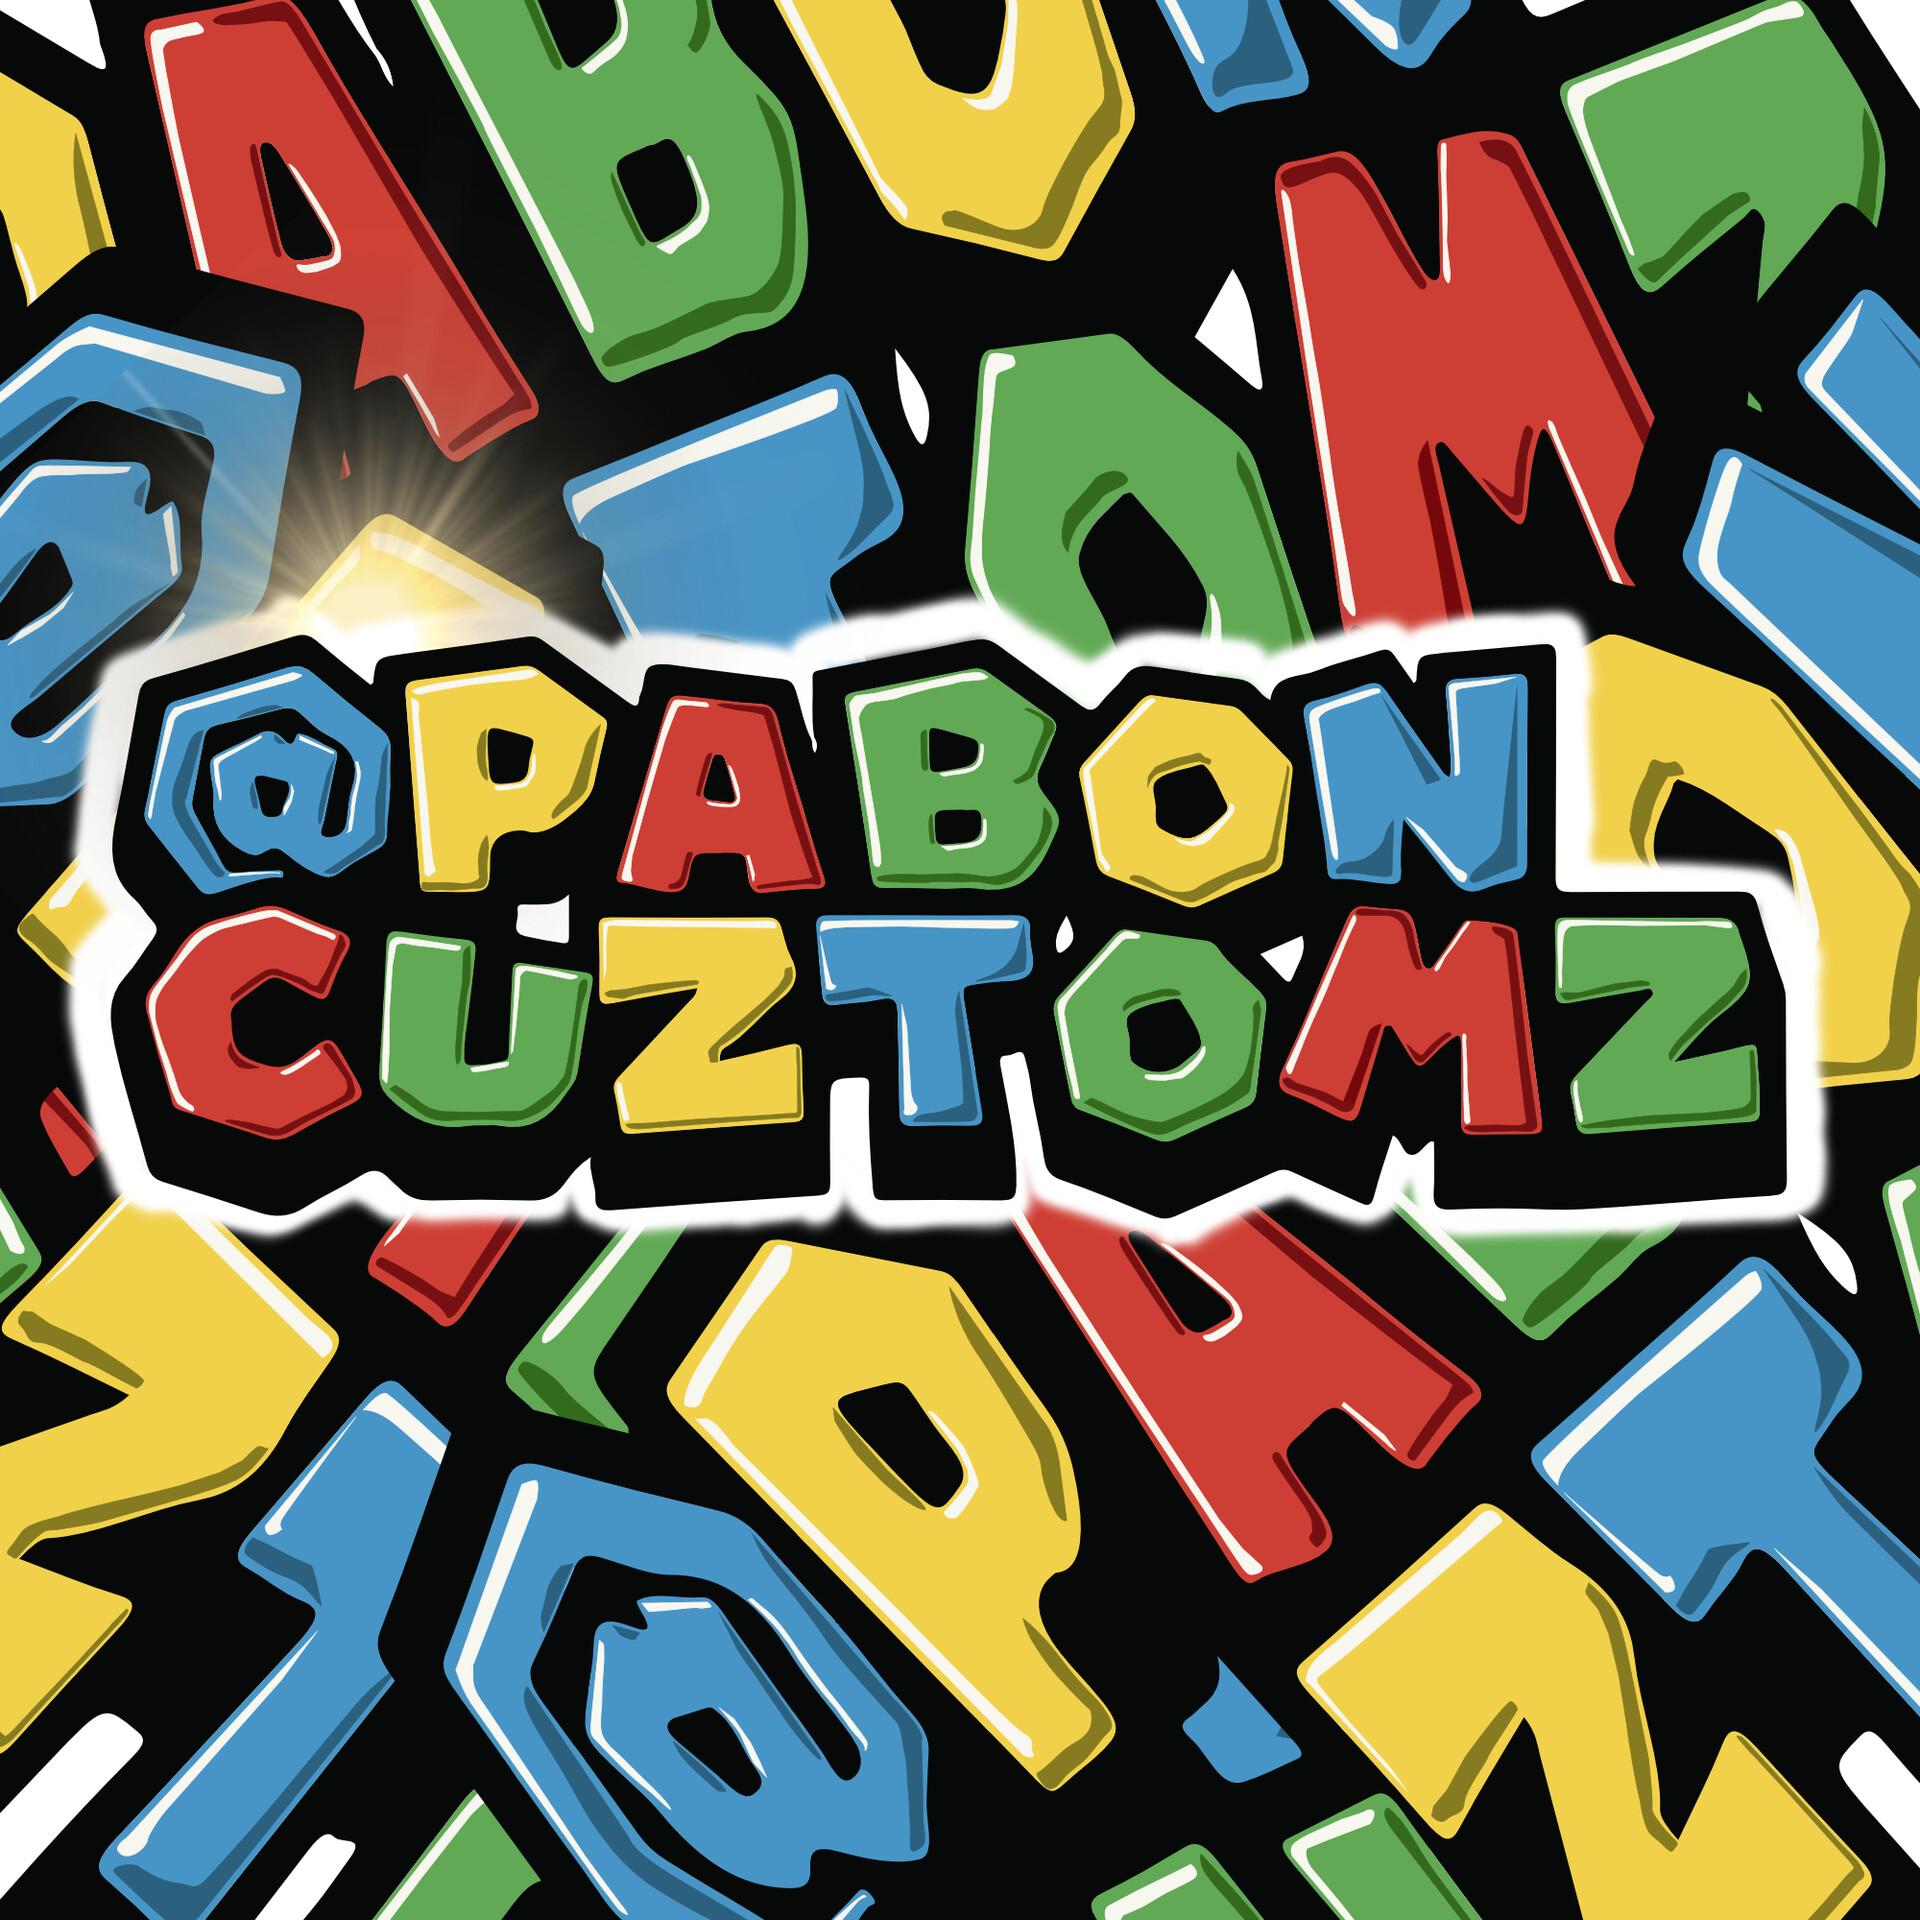 Logo re-design for @Pabon Cuztomz.